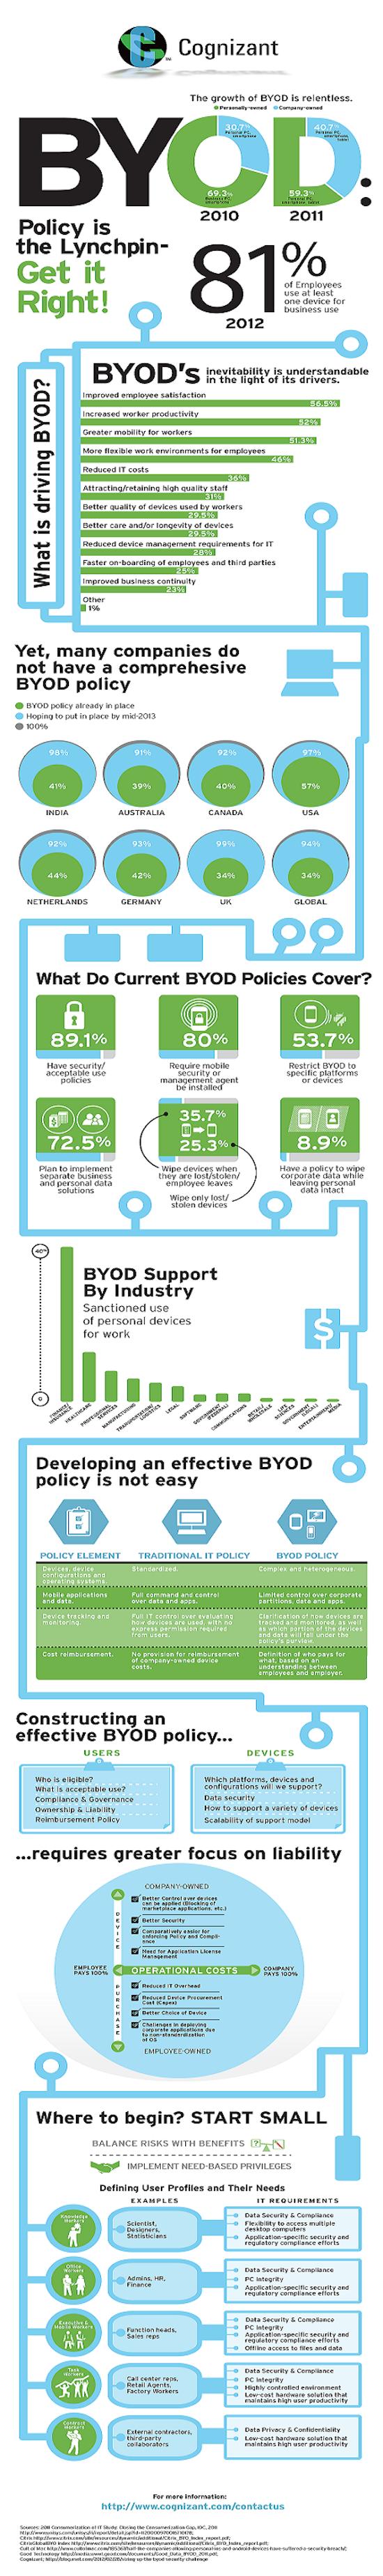 byod-infographic_big